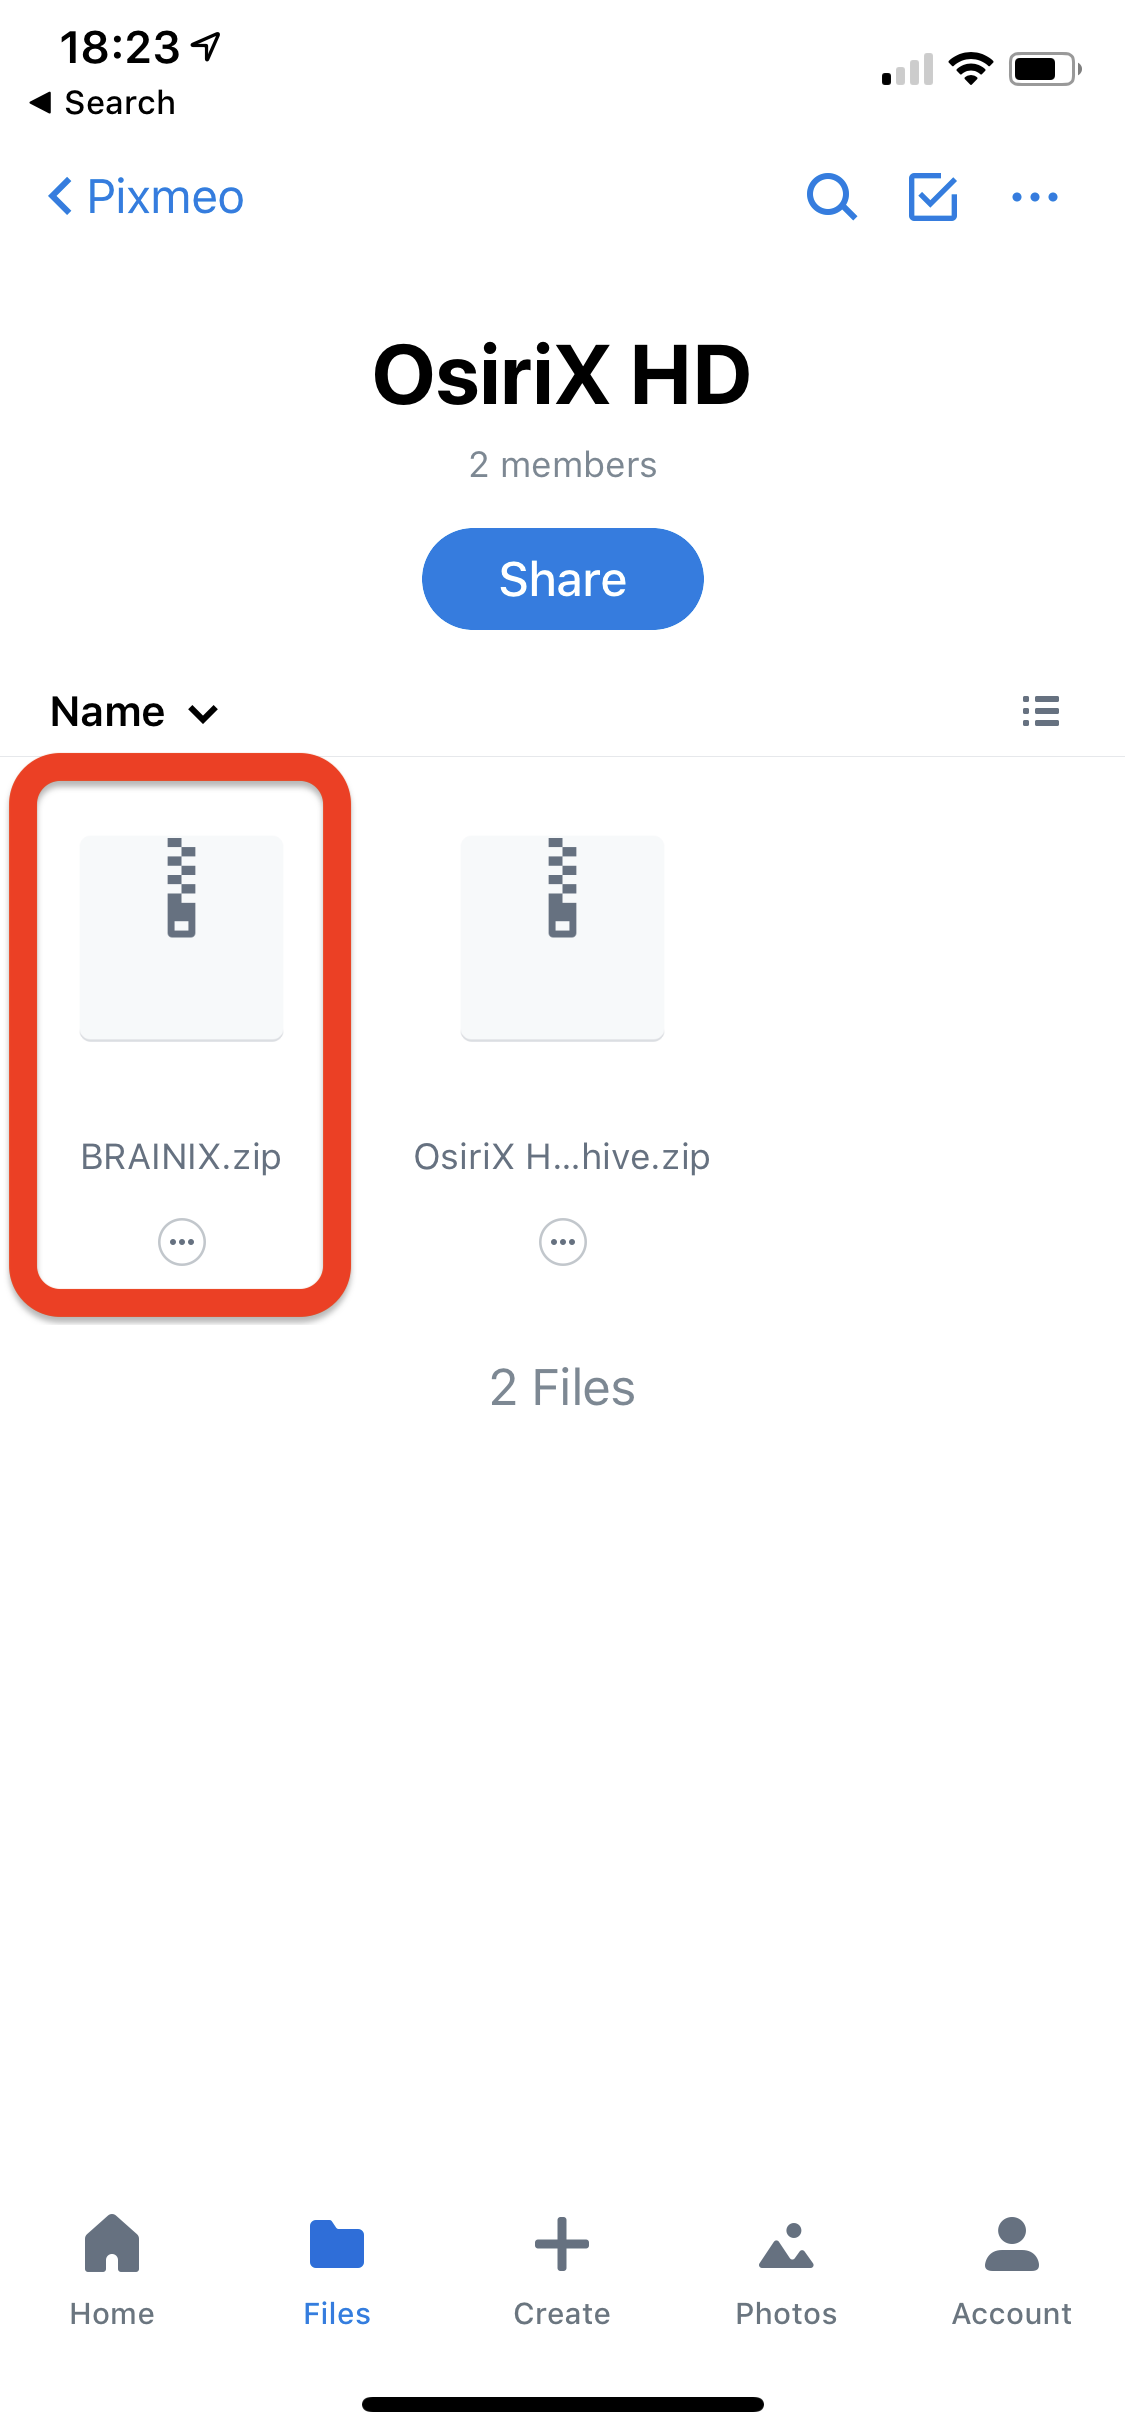 OsiriX HD User Manual